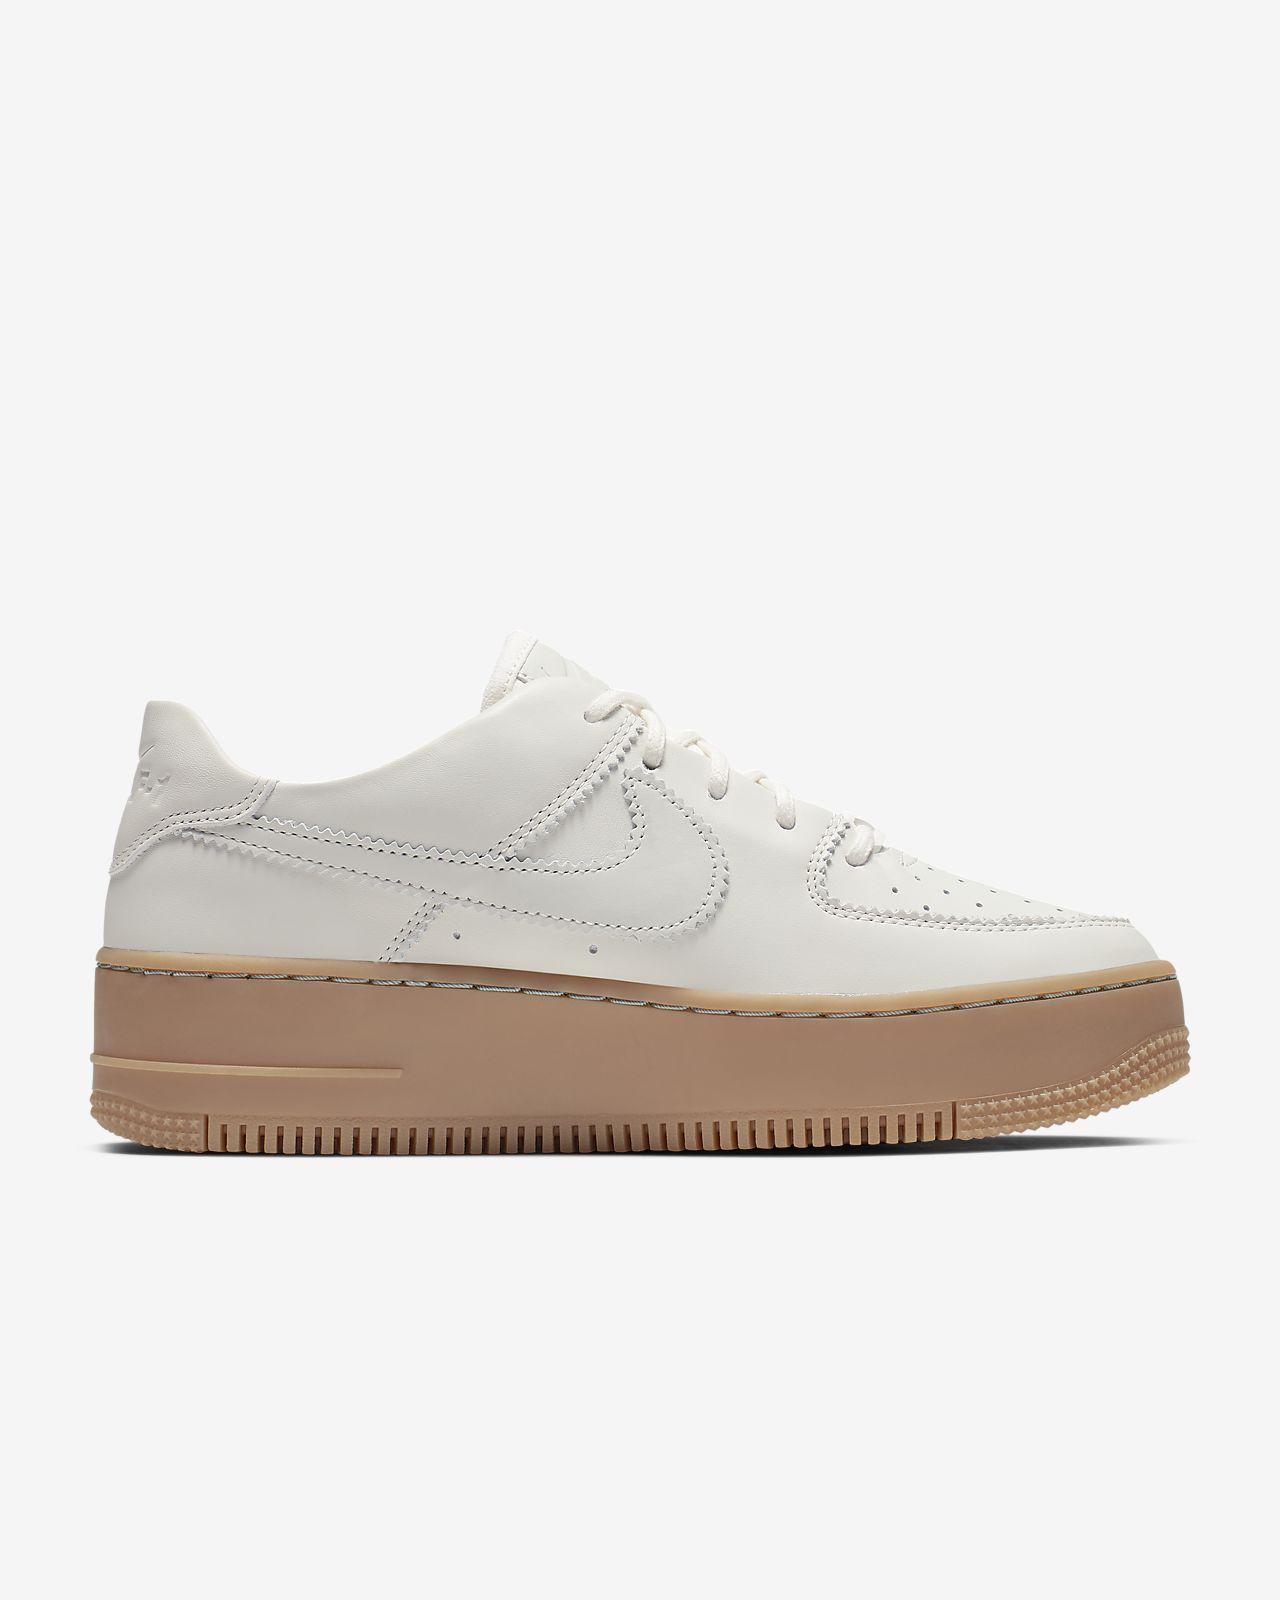 684e3db31a Nike Air Force 1 Sage Low LX Women's Shoe. Nike.com